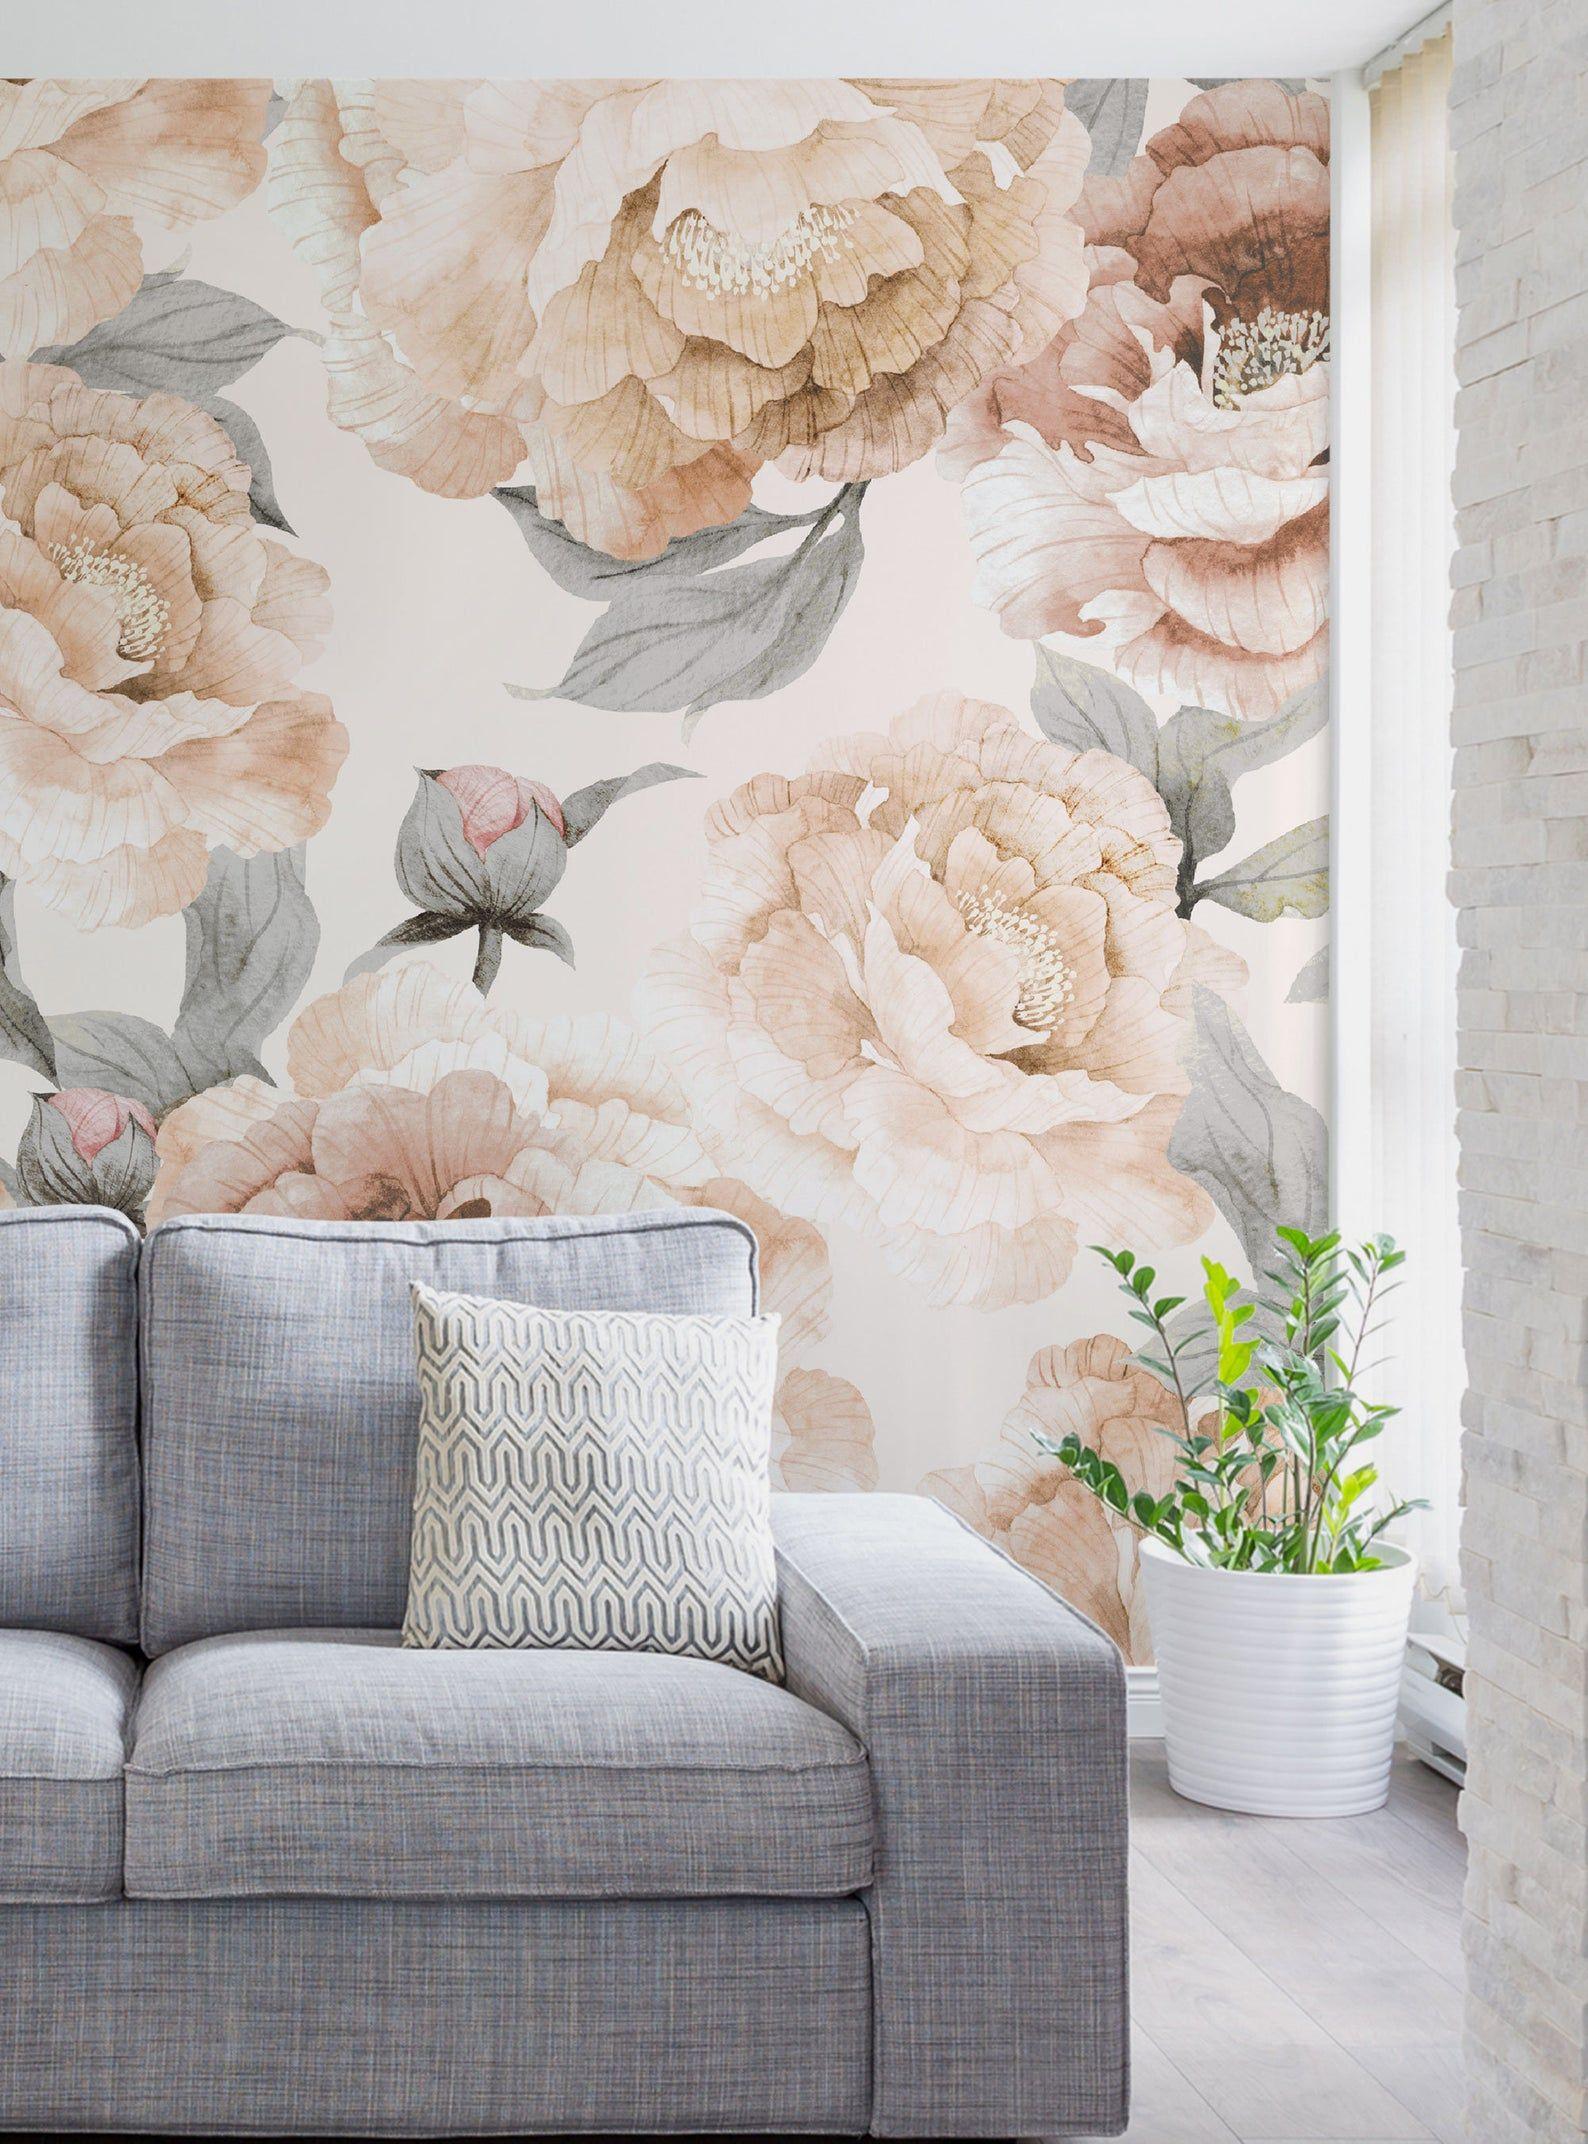 Bloom Flower Mural Wallpaper, Light Grey, Watercolor